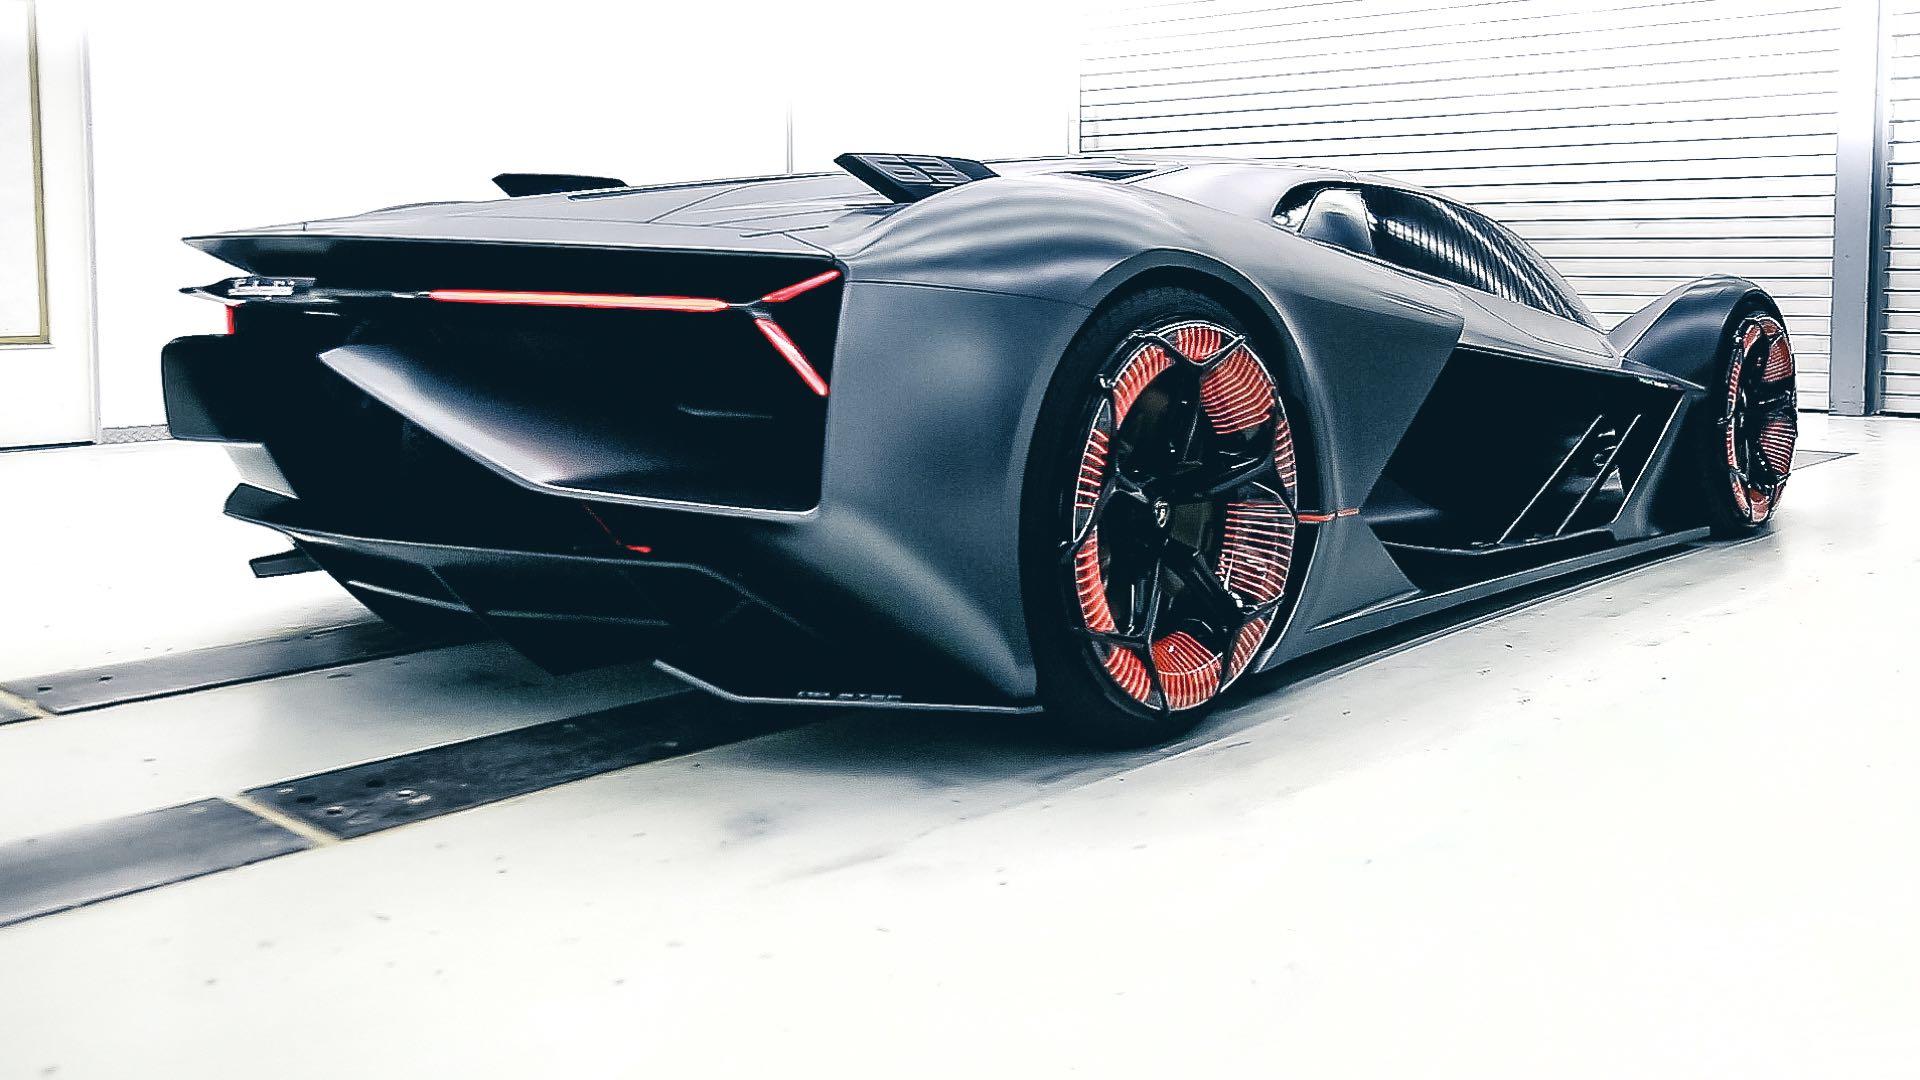 Lamborghini Terzo Millennio - 2017 - rear side-face / profil arrière